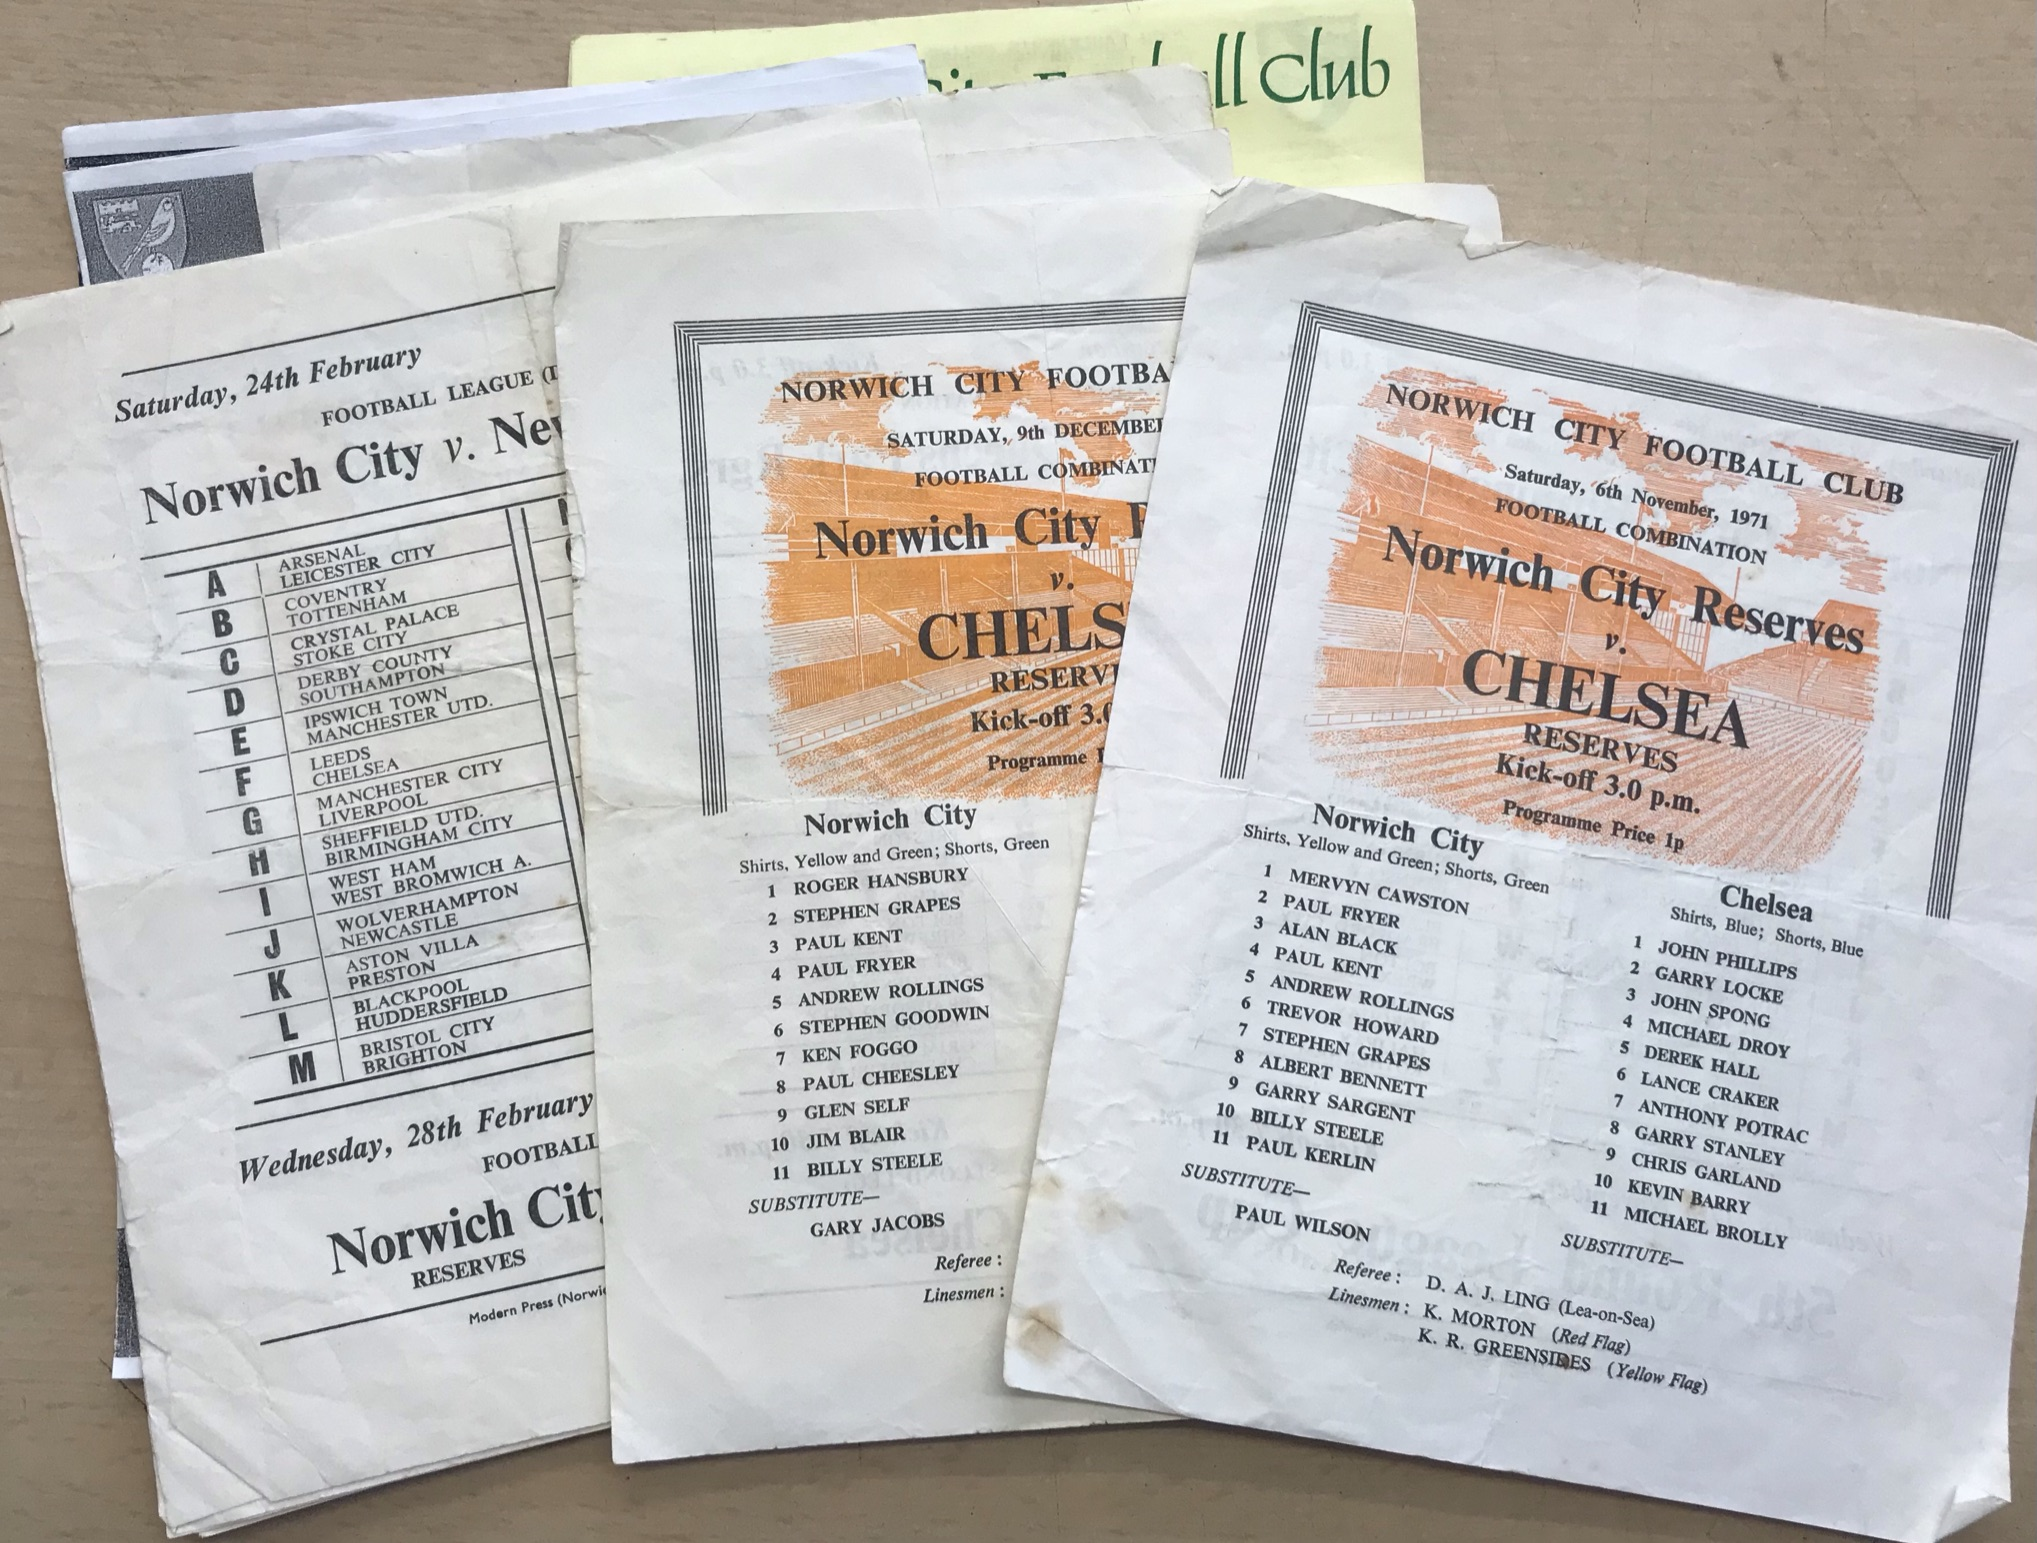 Norwich City Reserves 1971-73 - Chelsea Reserves 9 Dec 1972. Chelsea Reserves v Arsenal Reserves